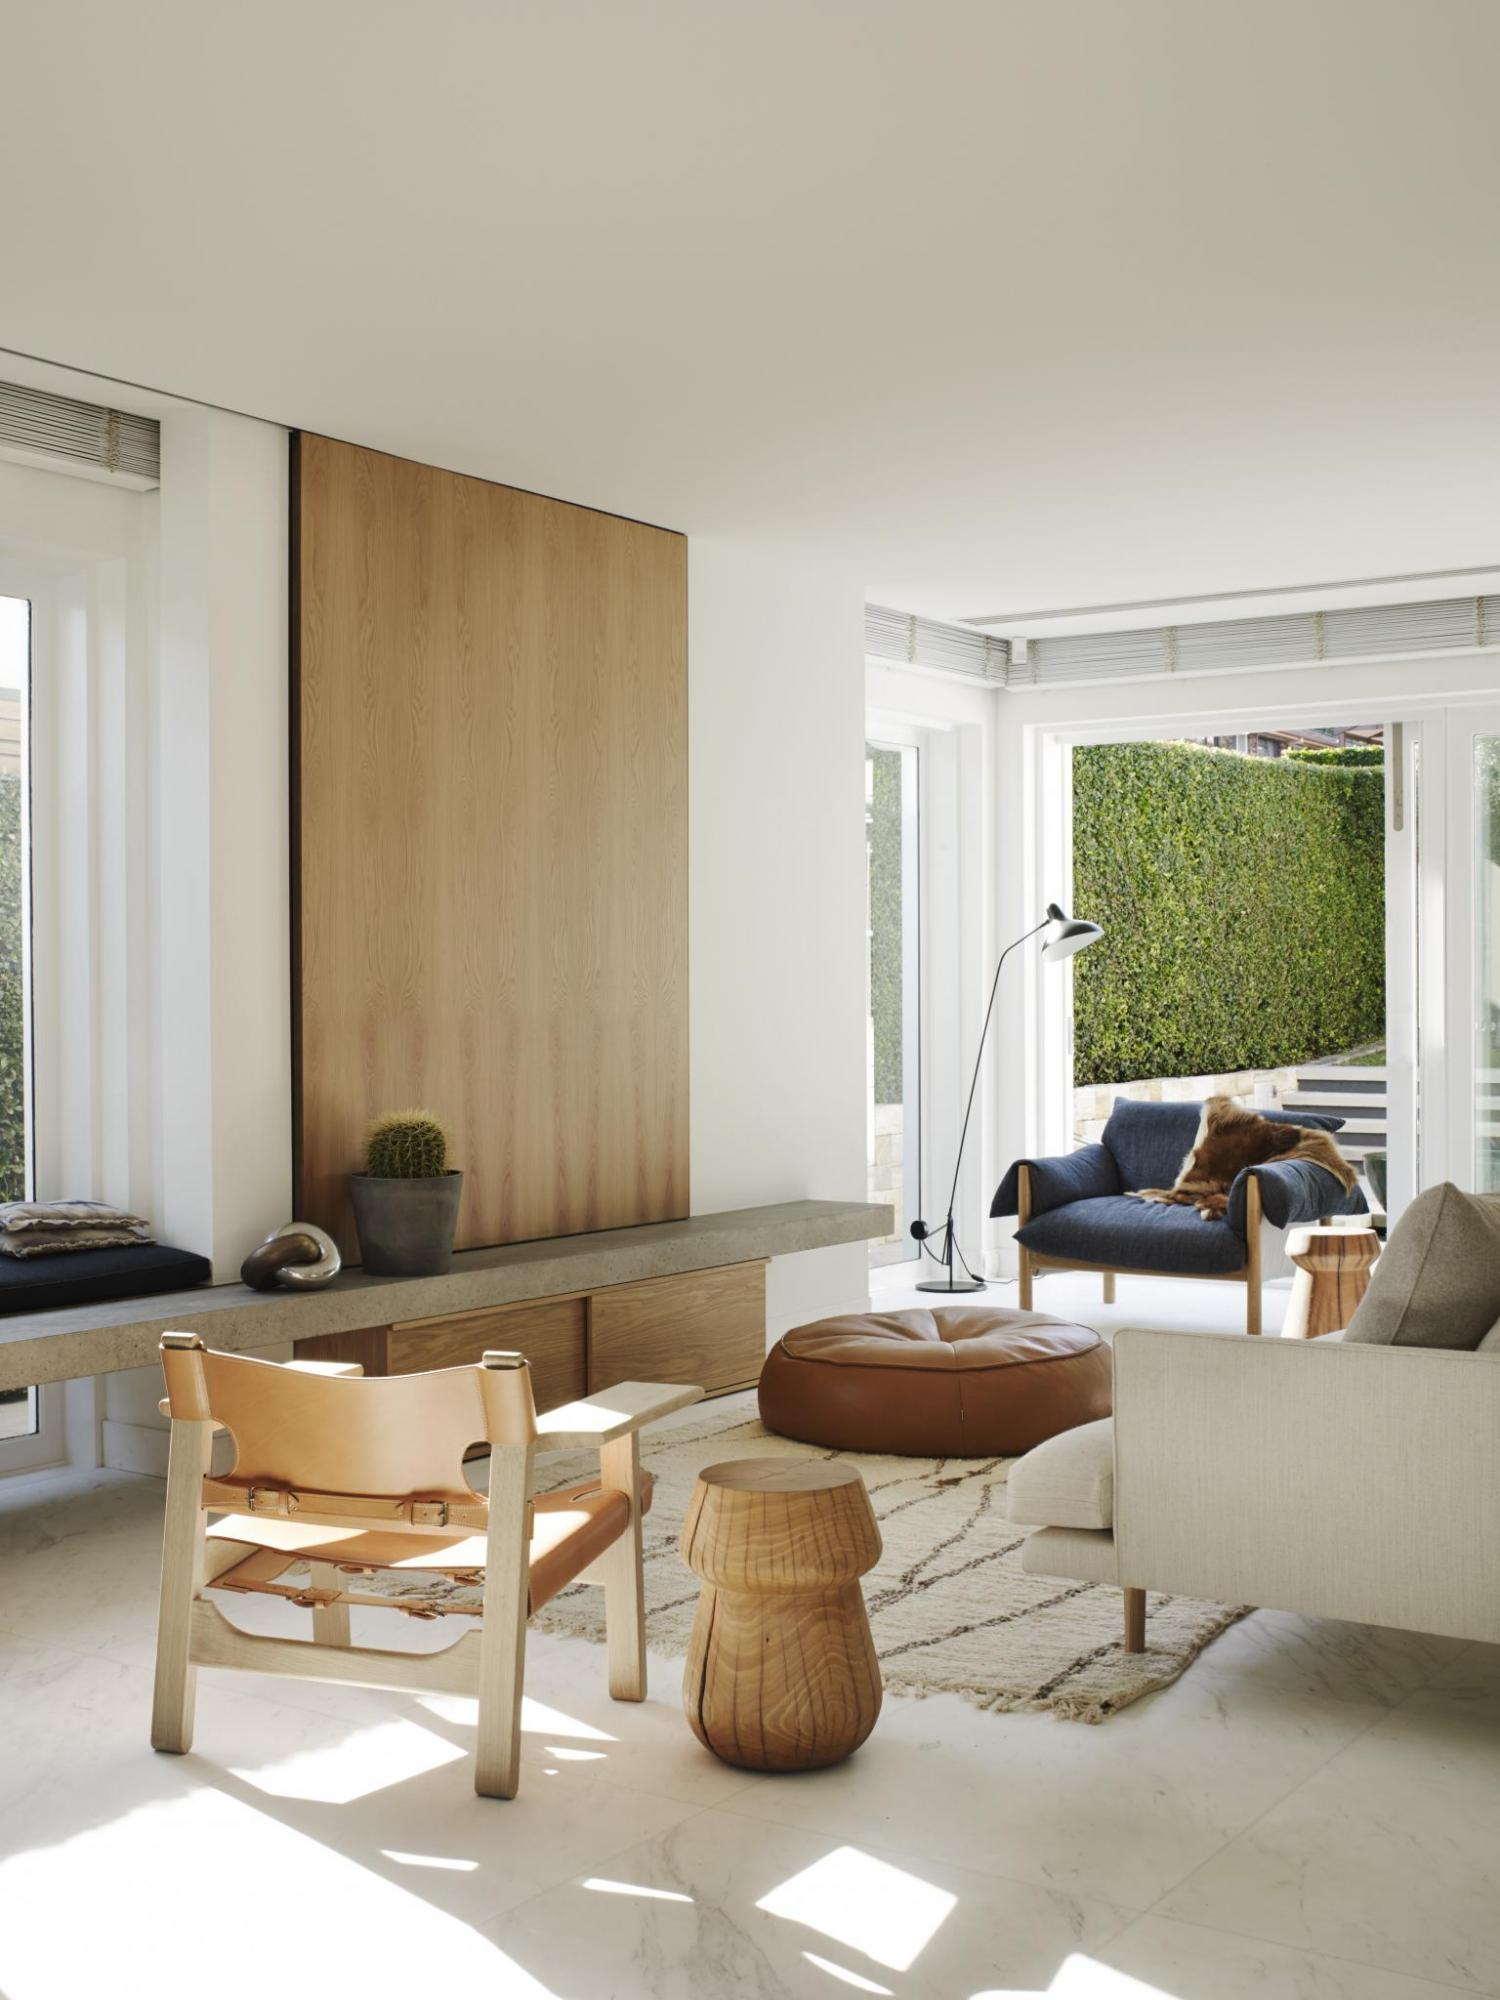 Cronulla Residence by Amber Road - Interior Design - Sydney, NSW, Australia - Australian Architecture